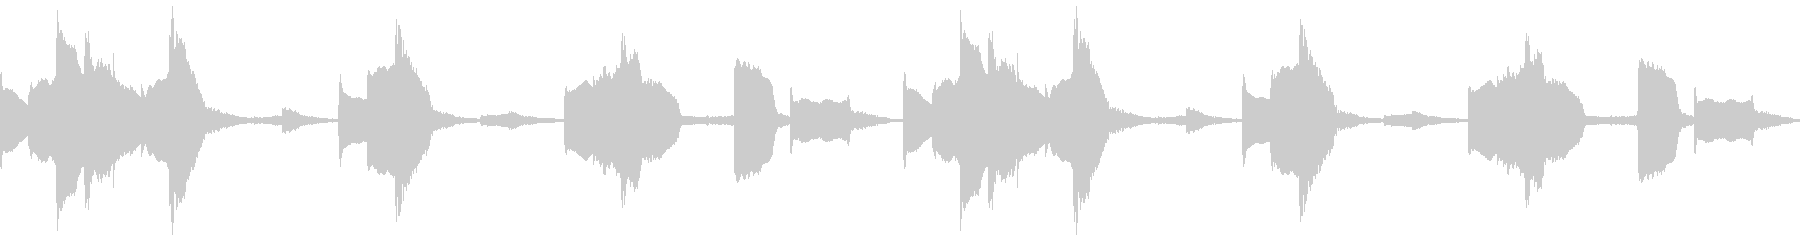 Tech テクノフレーズ 1 音楽制作用の未再生の波形